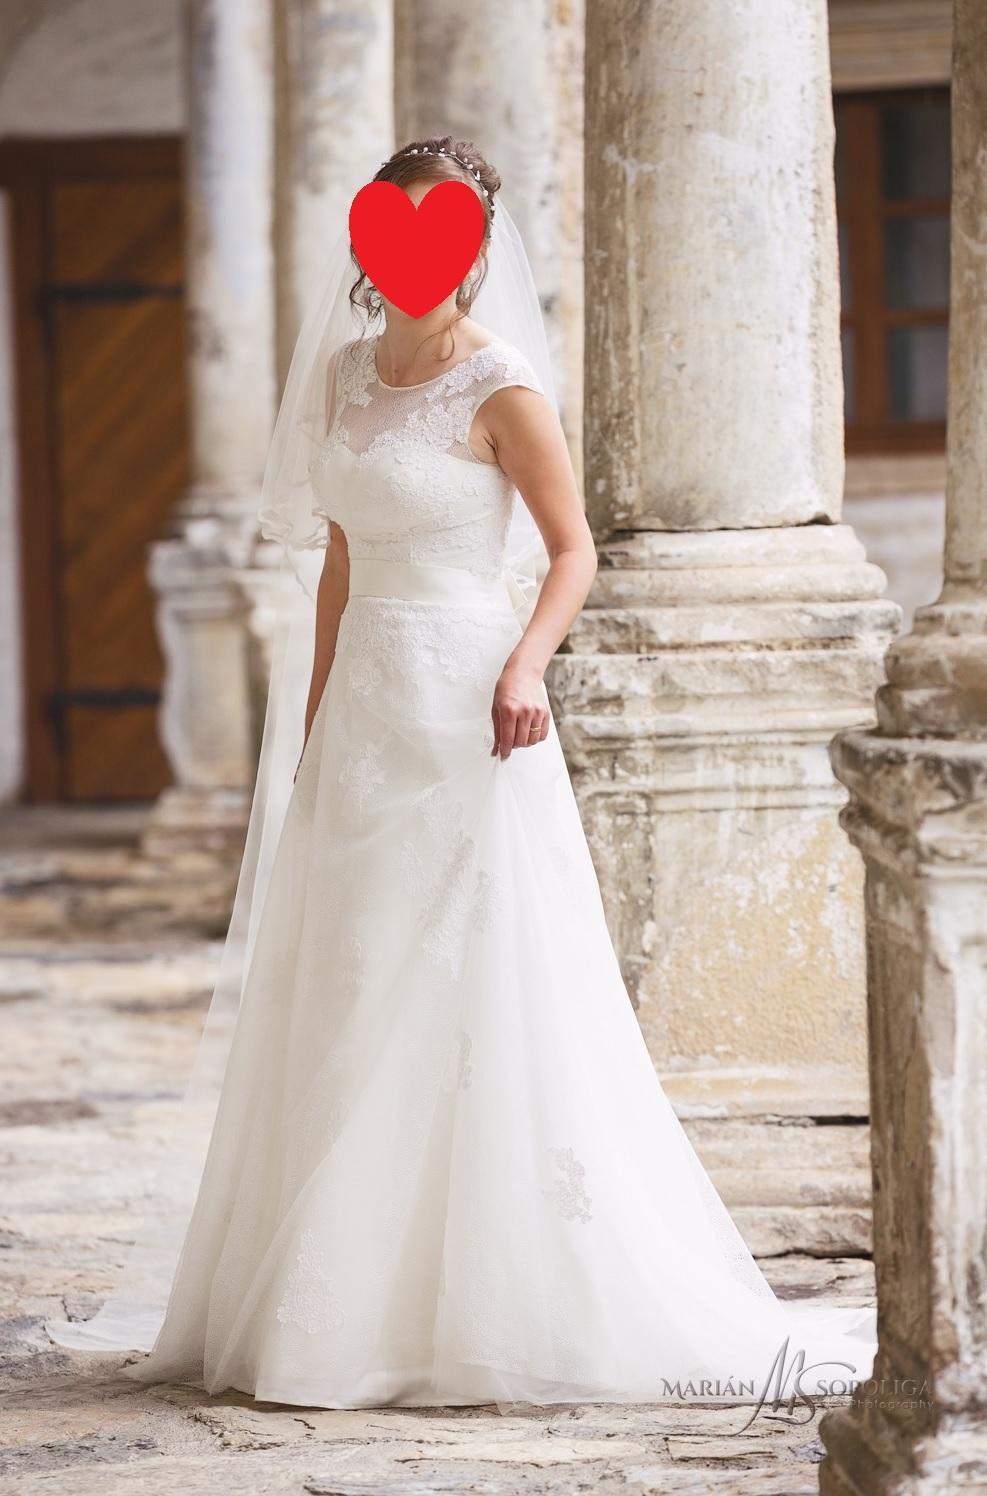 Romanticke Krajkove Svatebni Saty Zavoj Zdarma 36 4 000 Kc